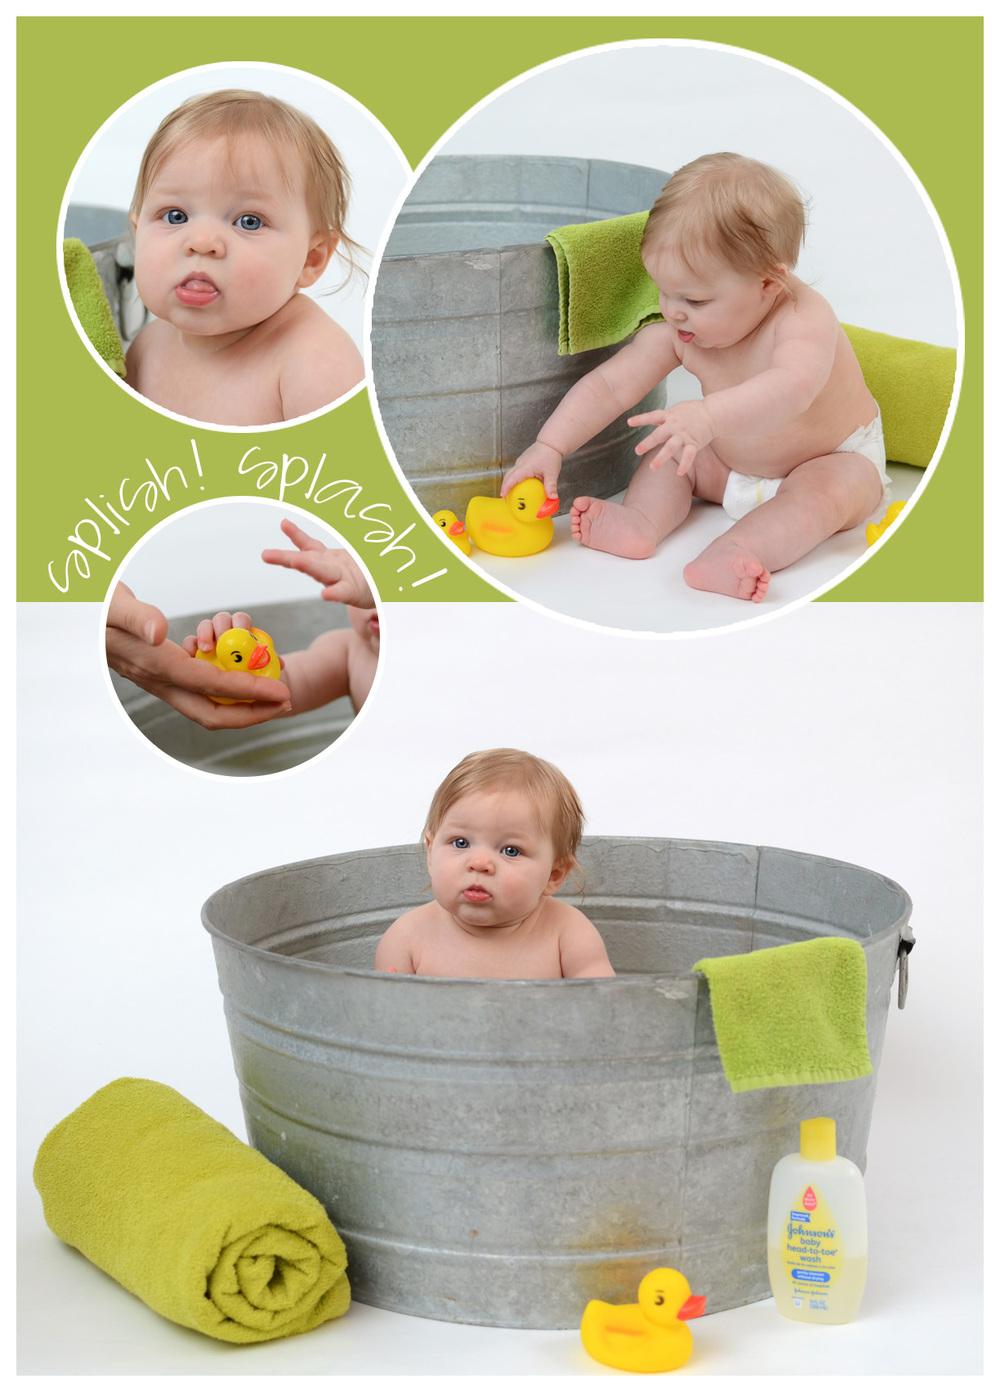 bathtub collagetext.jpg